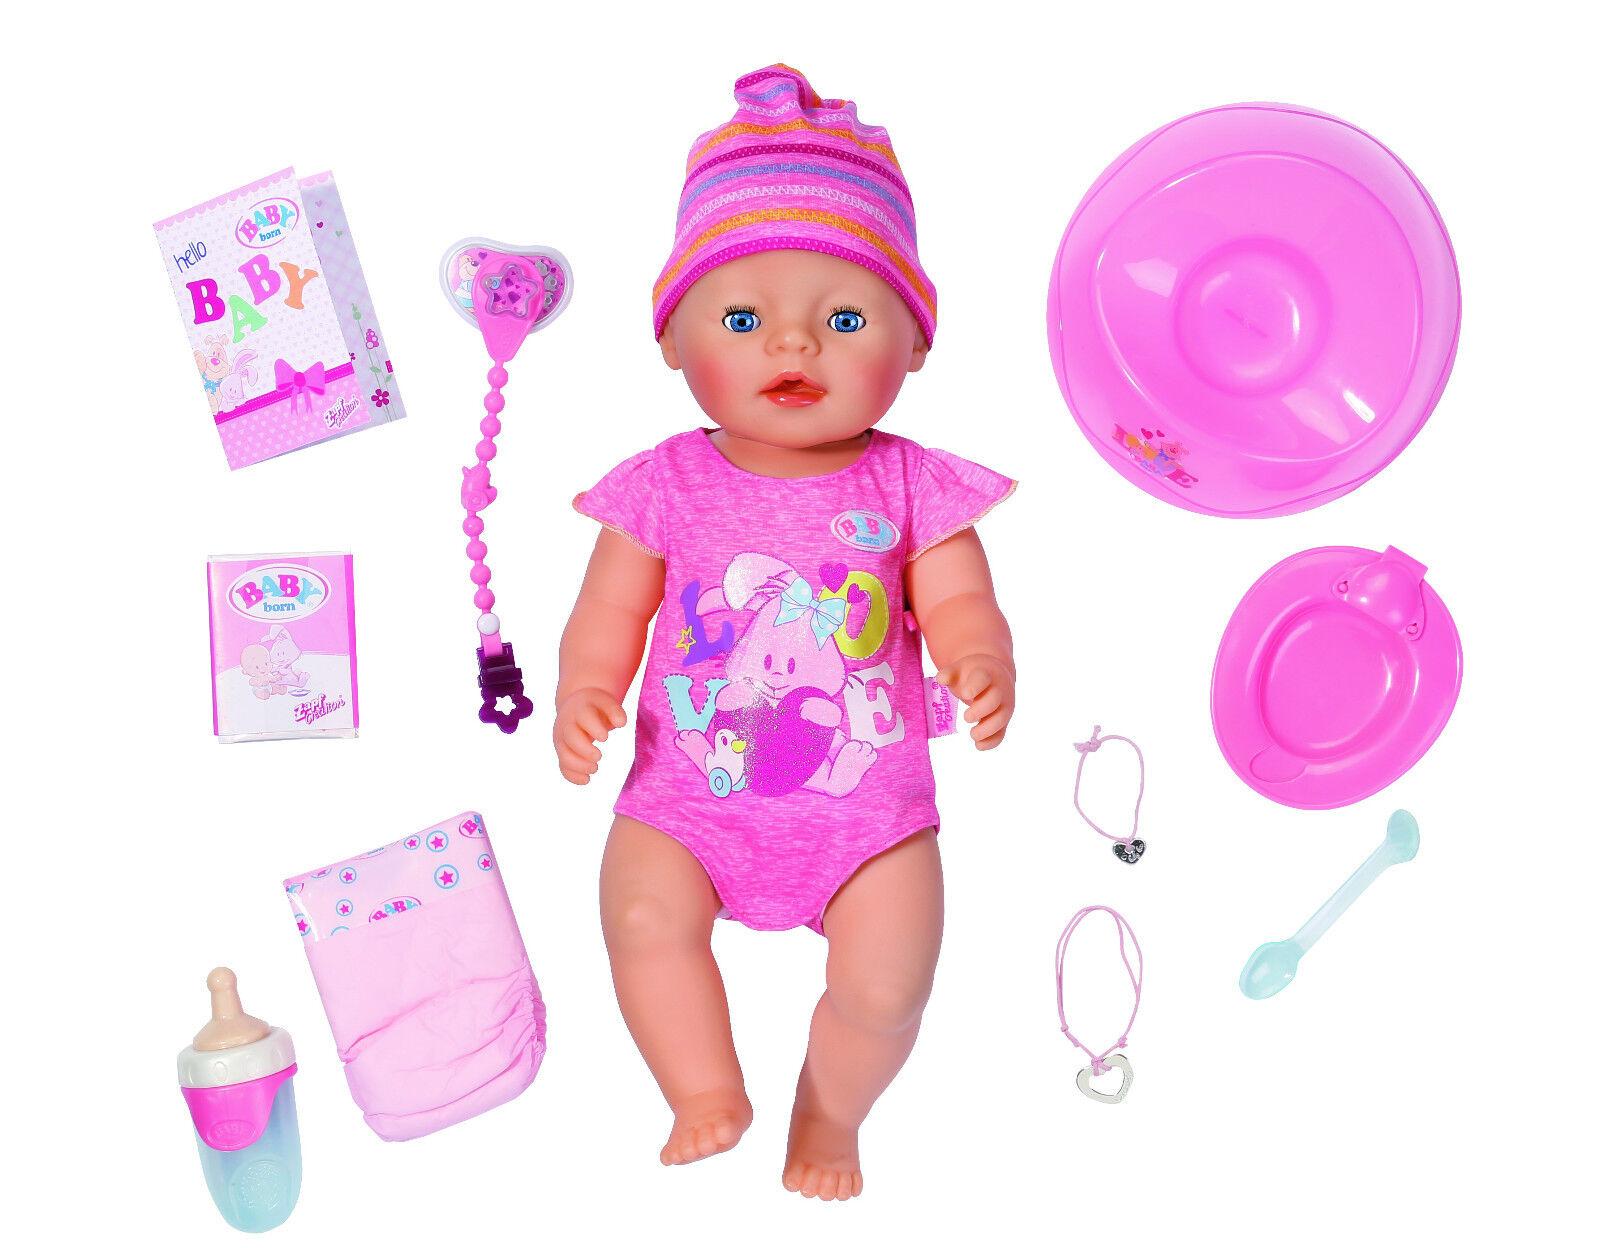 Zapf Creation Baby Born interactiv 822005 Spielzeug  brandtoys